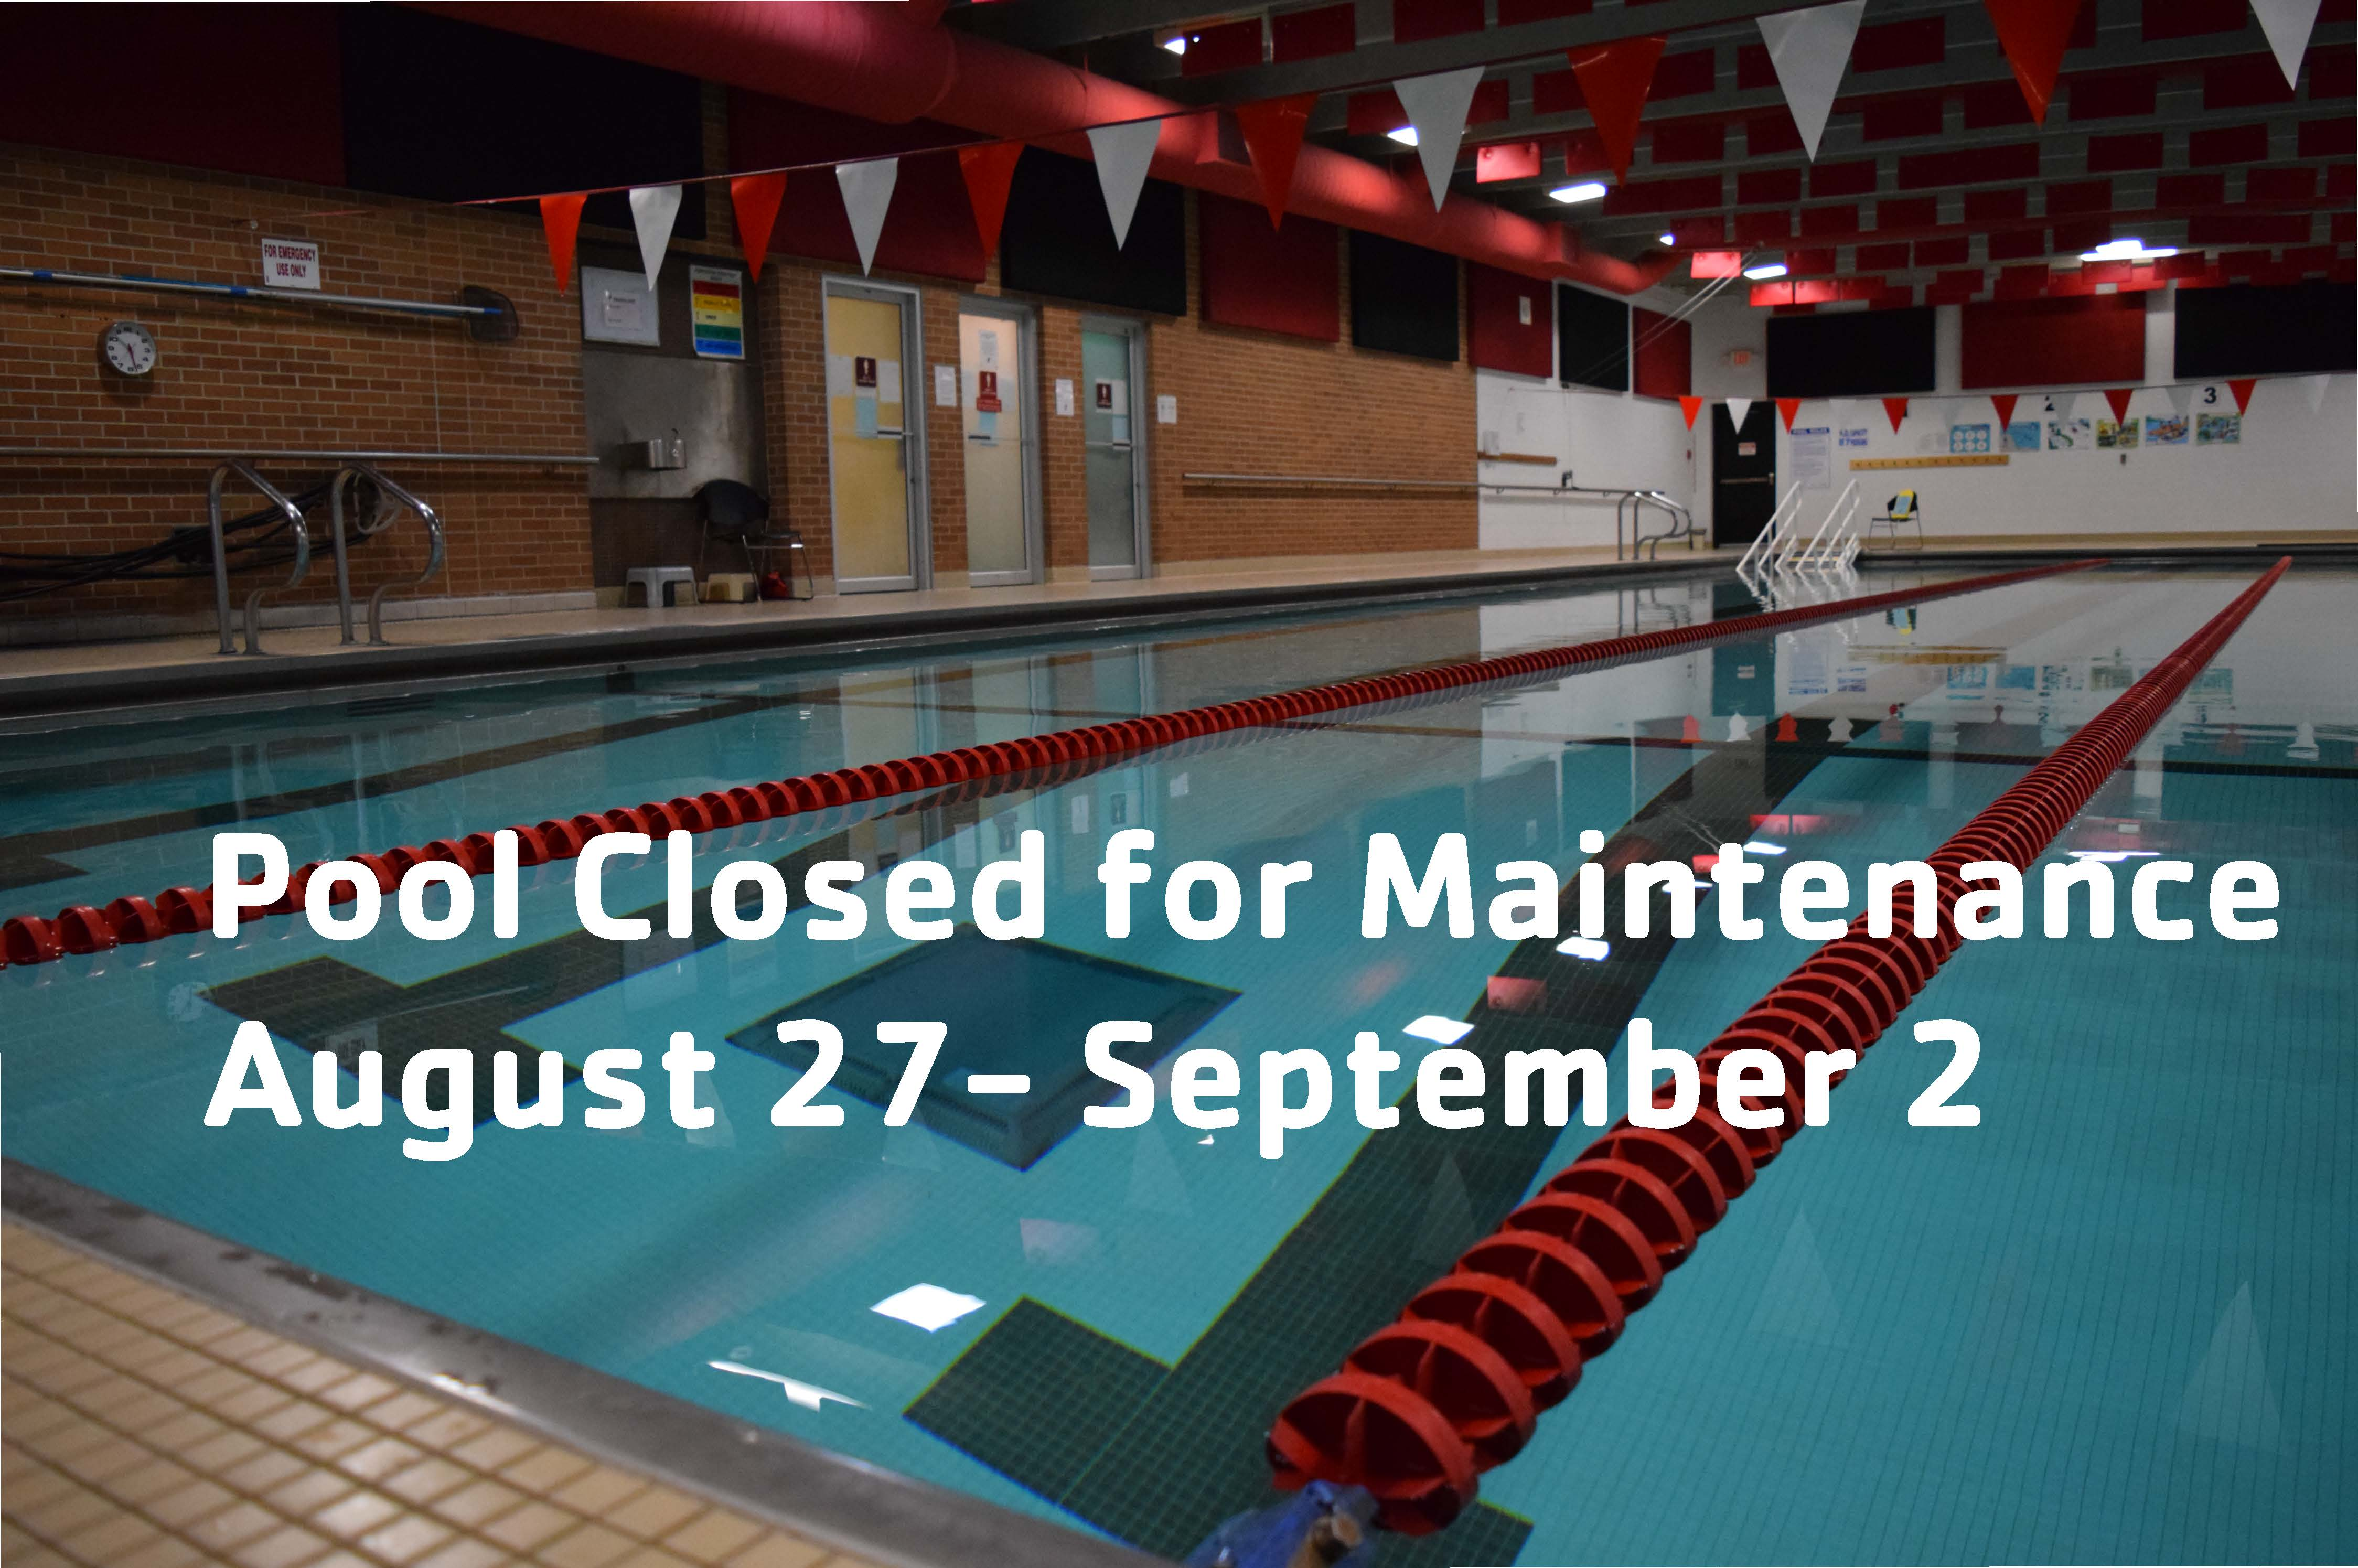 Pool Closure August 27-September 2